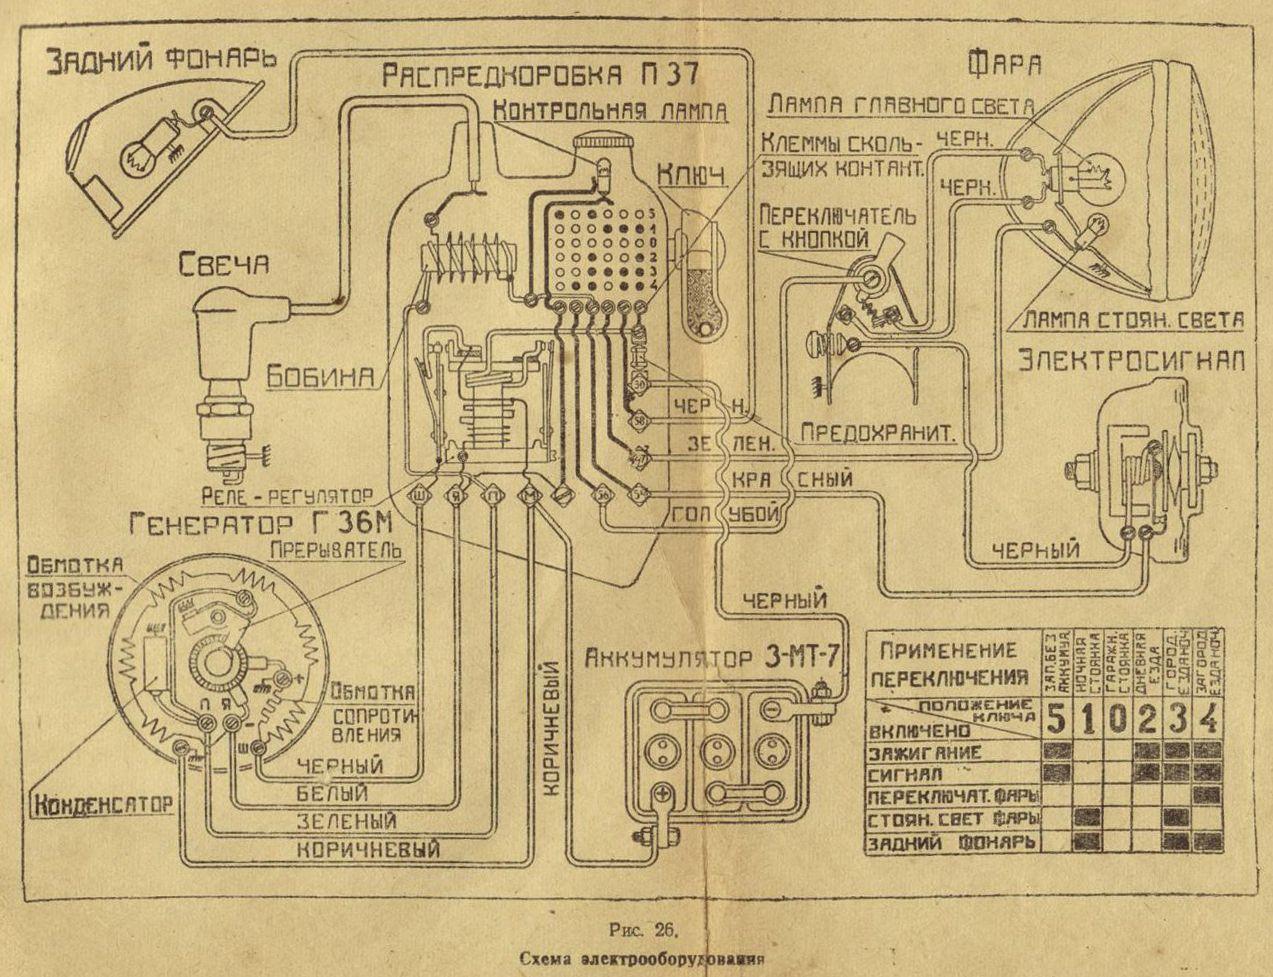 Schaltplan russisch aus dem Izh-49 Handbuch | Iž | Pinterest ...